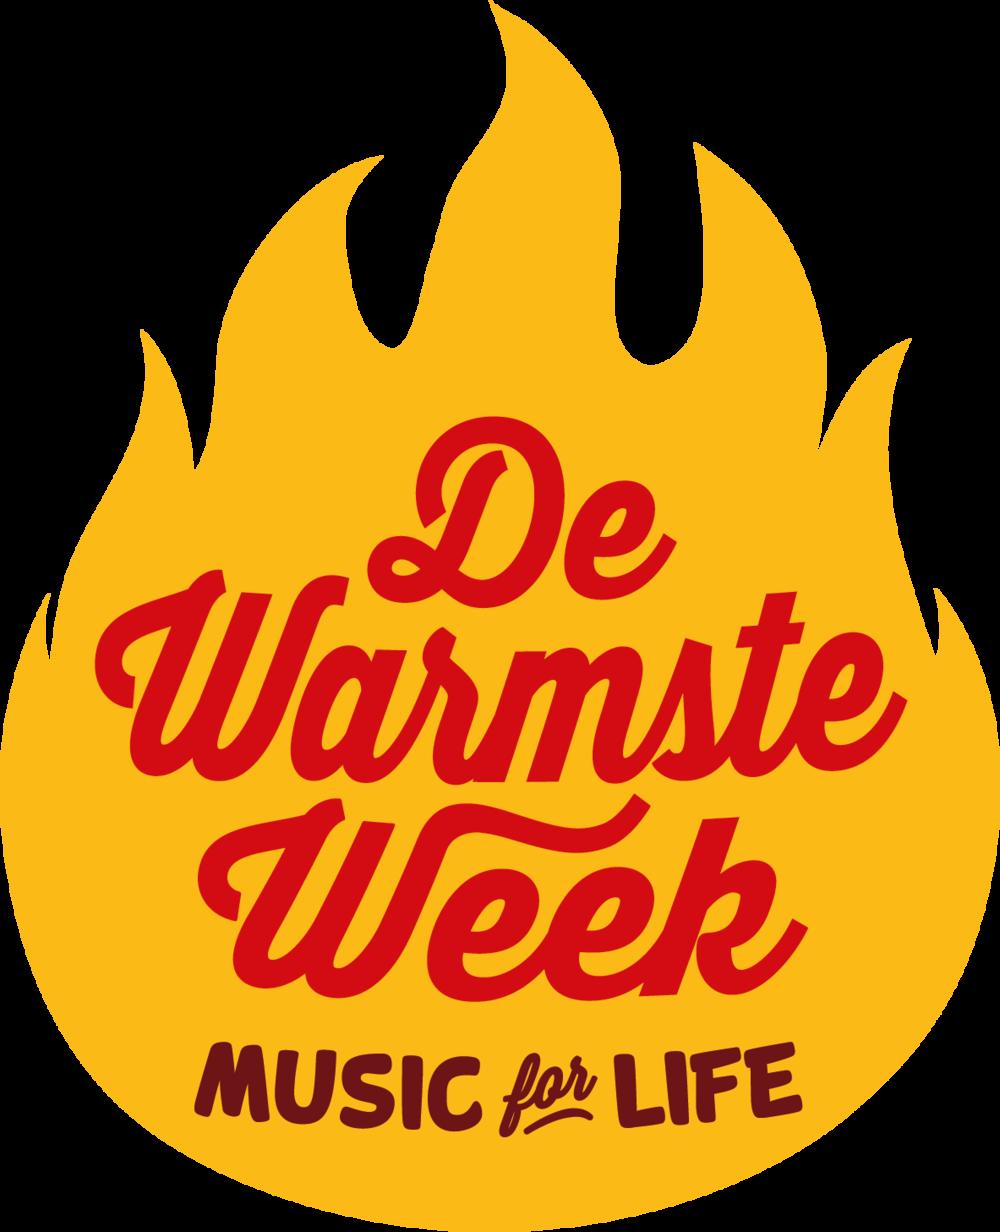 logo_de_warmste_week-1.png